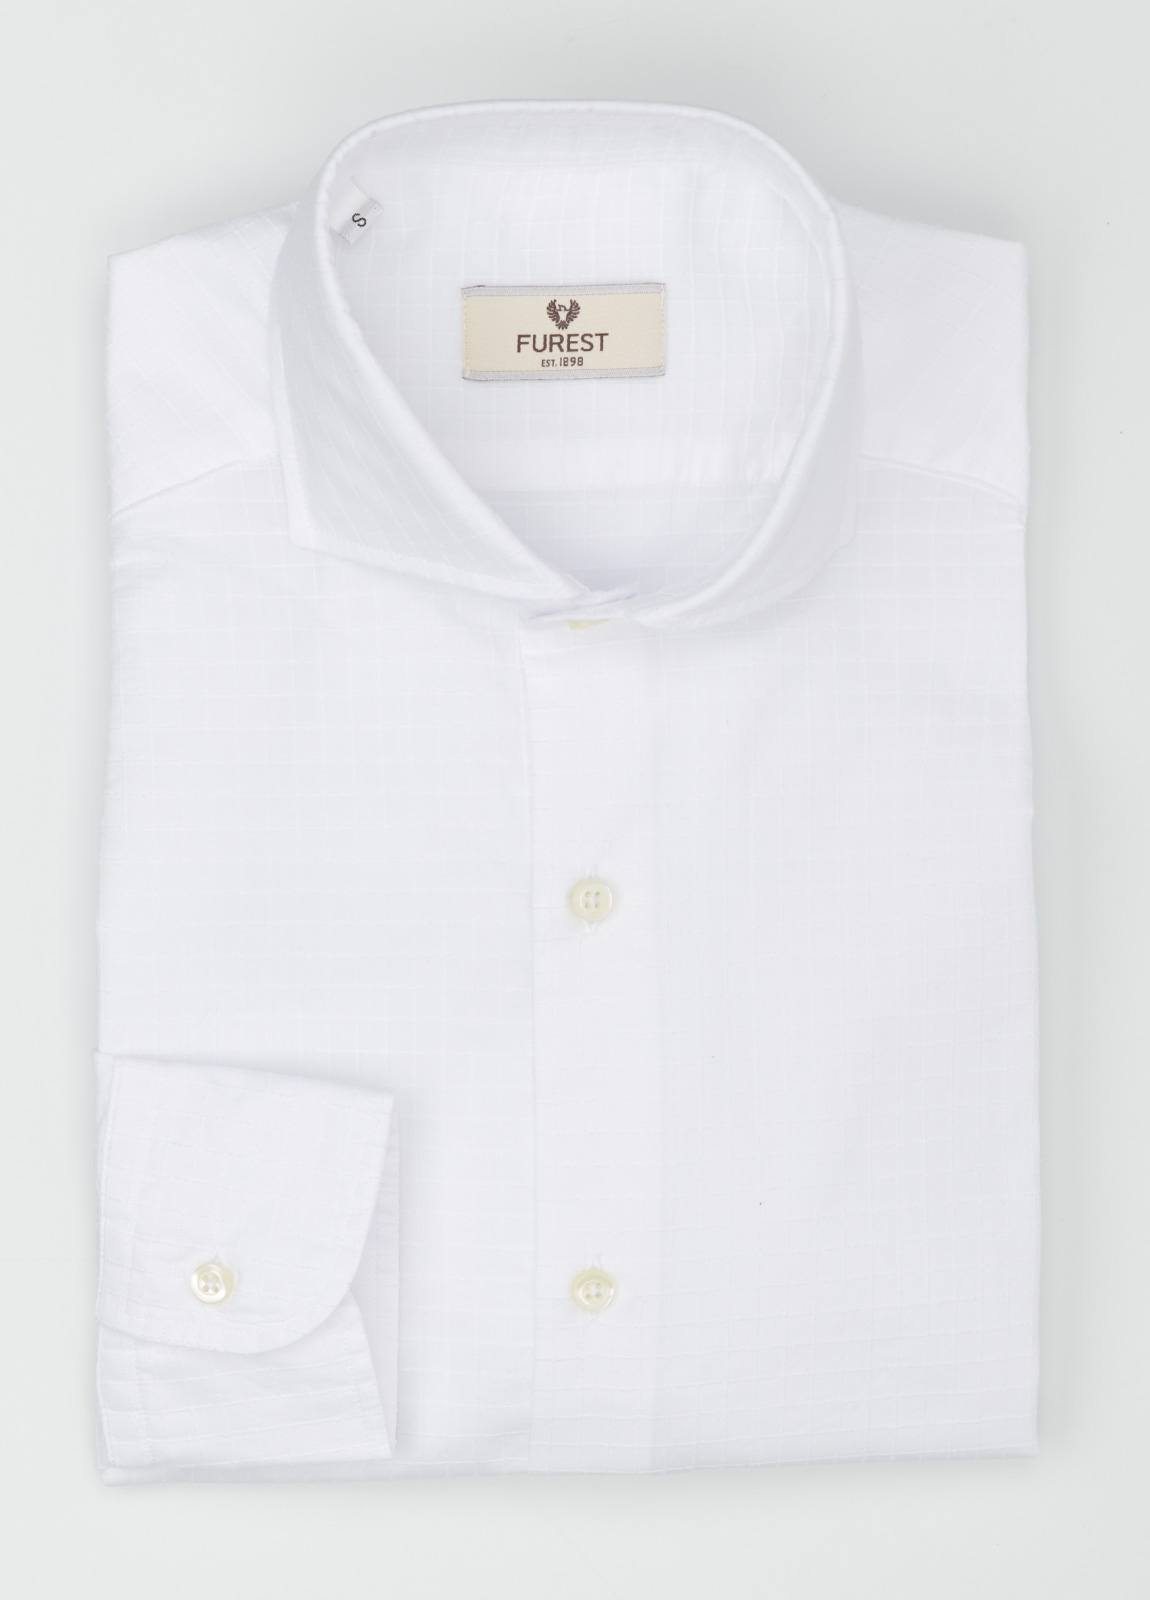 Camisa Leisure Wear SLIM FIT Modelo CAPRI tejido cuadro ventana color blanco, 100% Algodón. - Ítem1